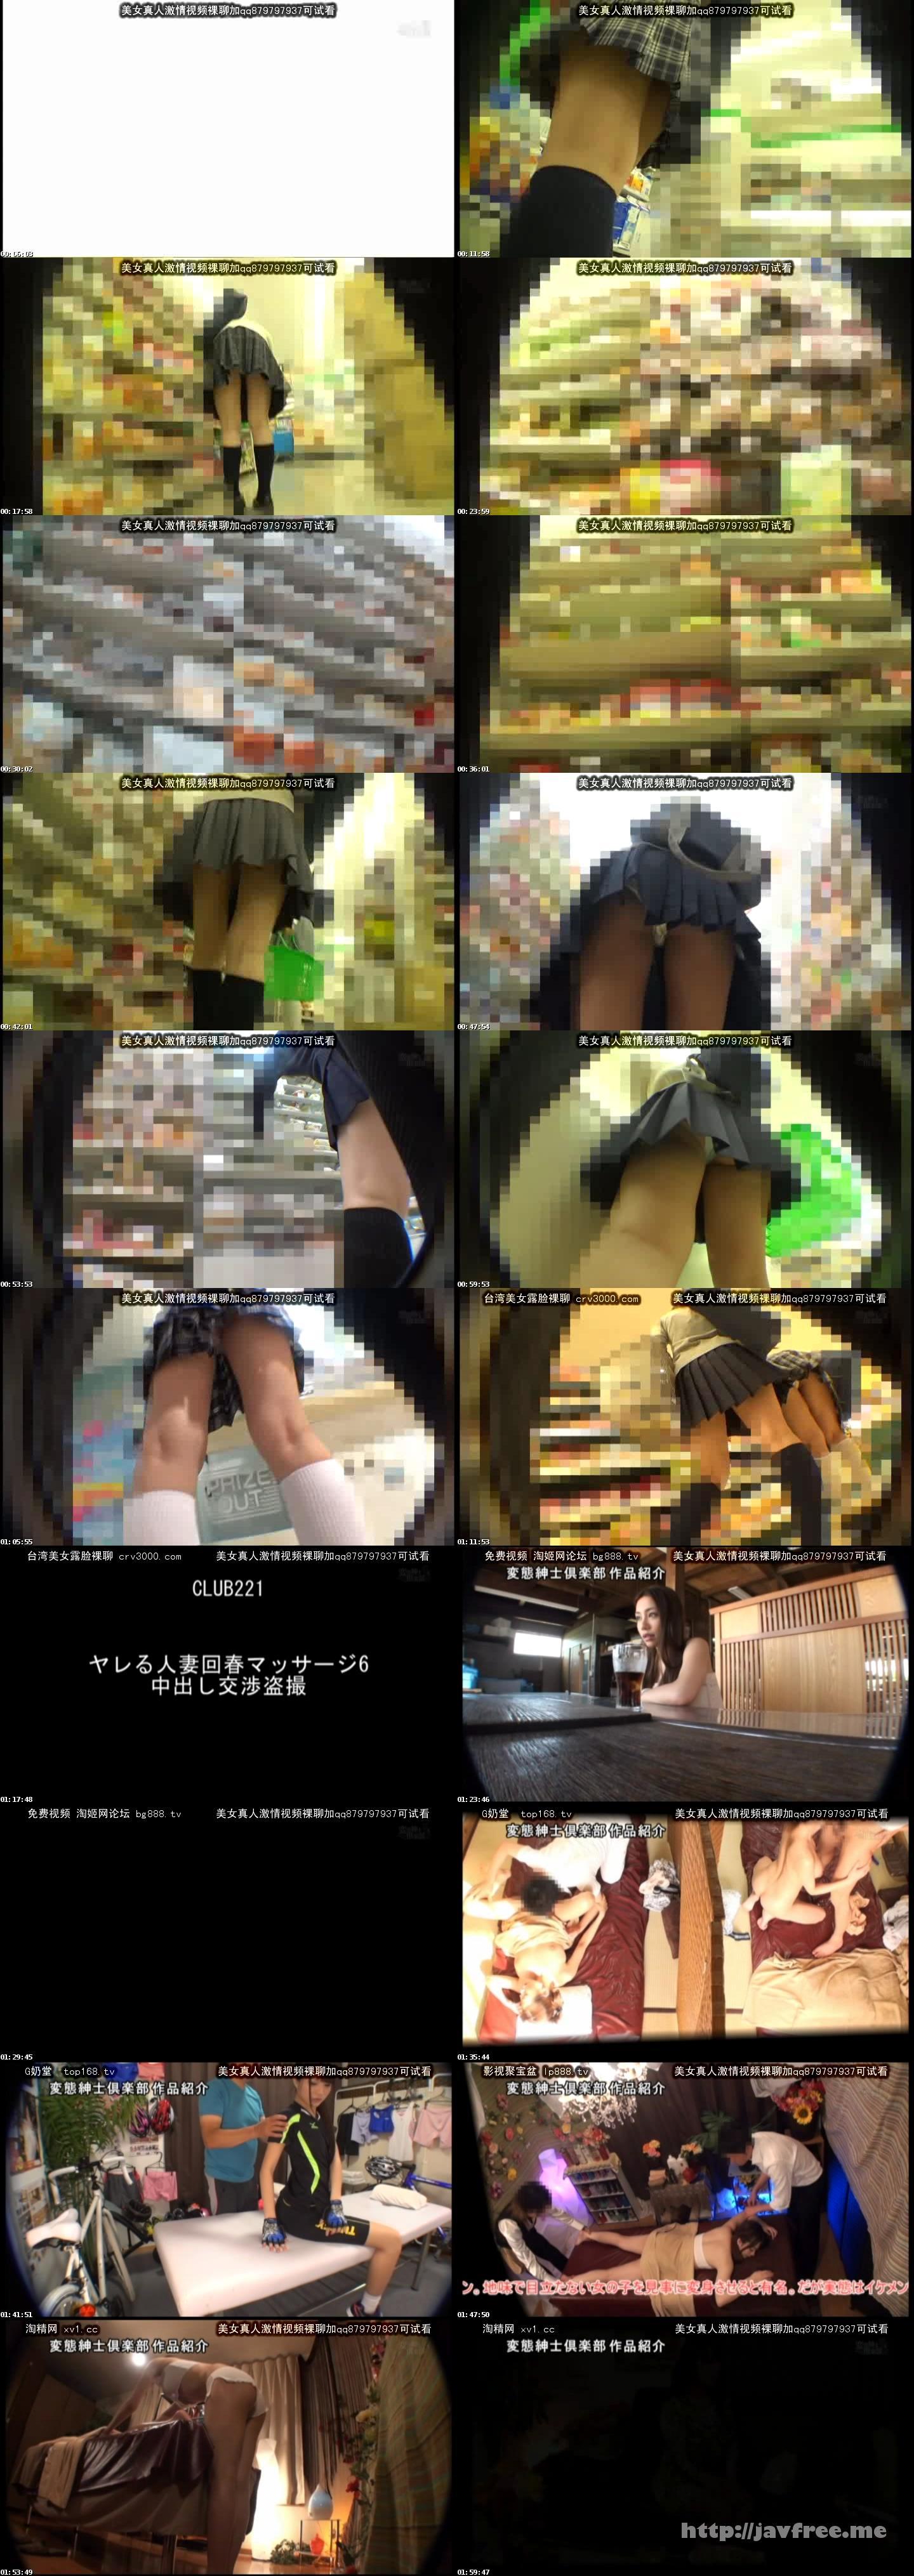 [CLUB 238] 街エロ盗撮 東京パンチラ捜査線 女子校生編7 CLUB